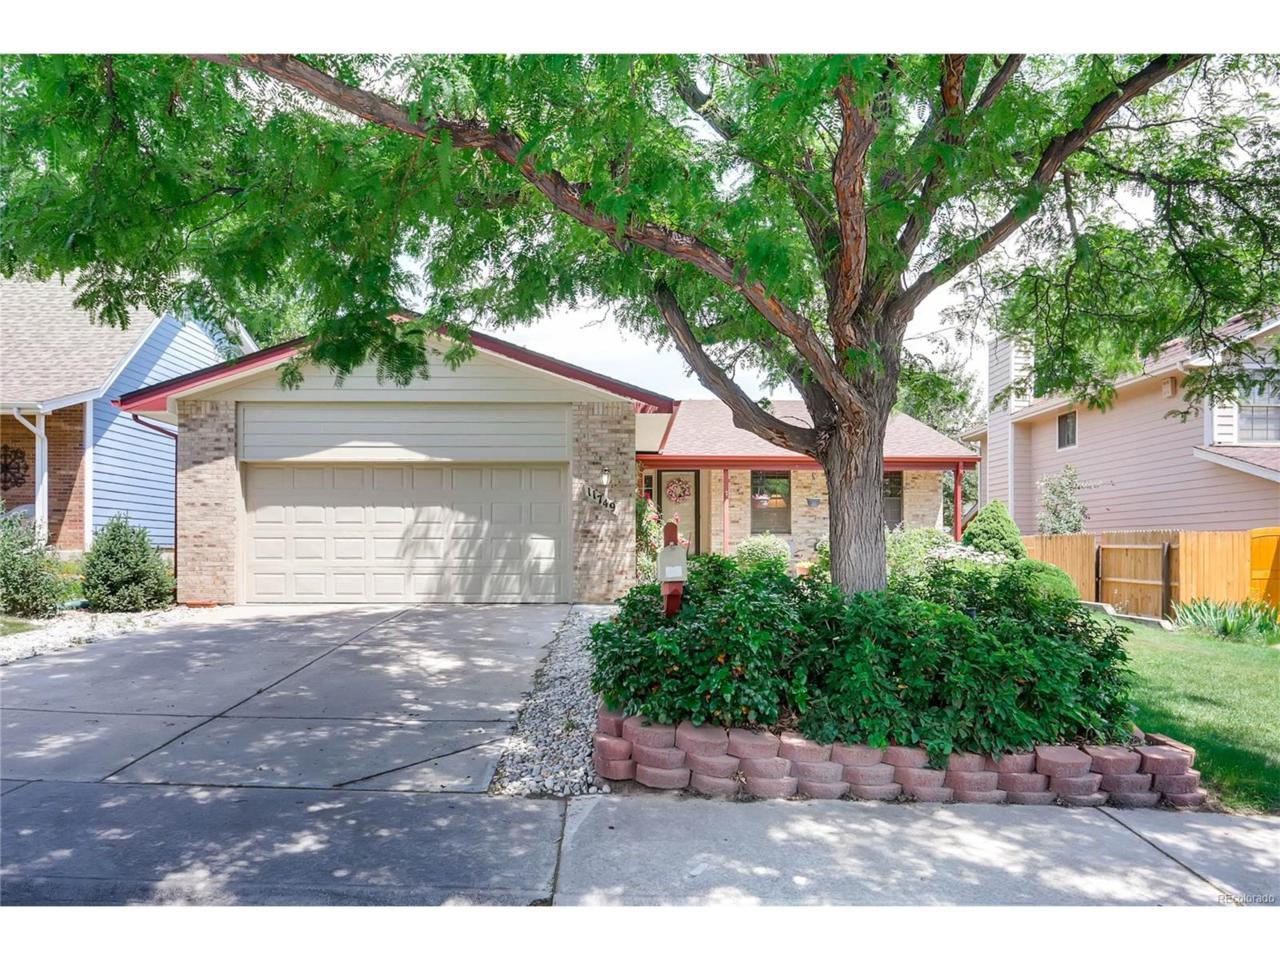 11749 E Asbury Avenue, Aurora, CO 80014 (MLS #6287807) :: 8z Real Estate